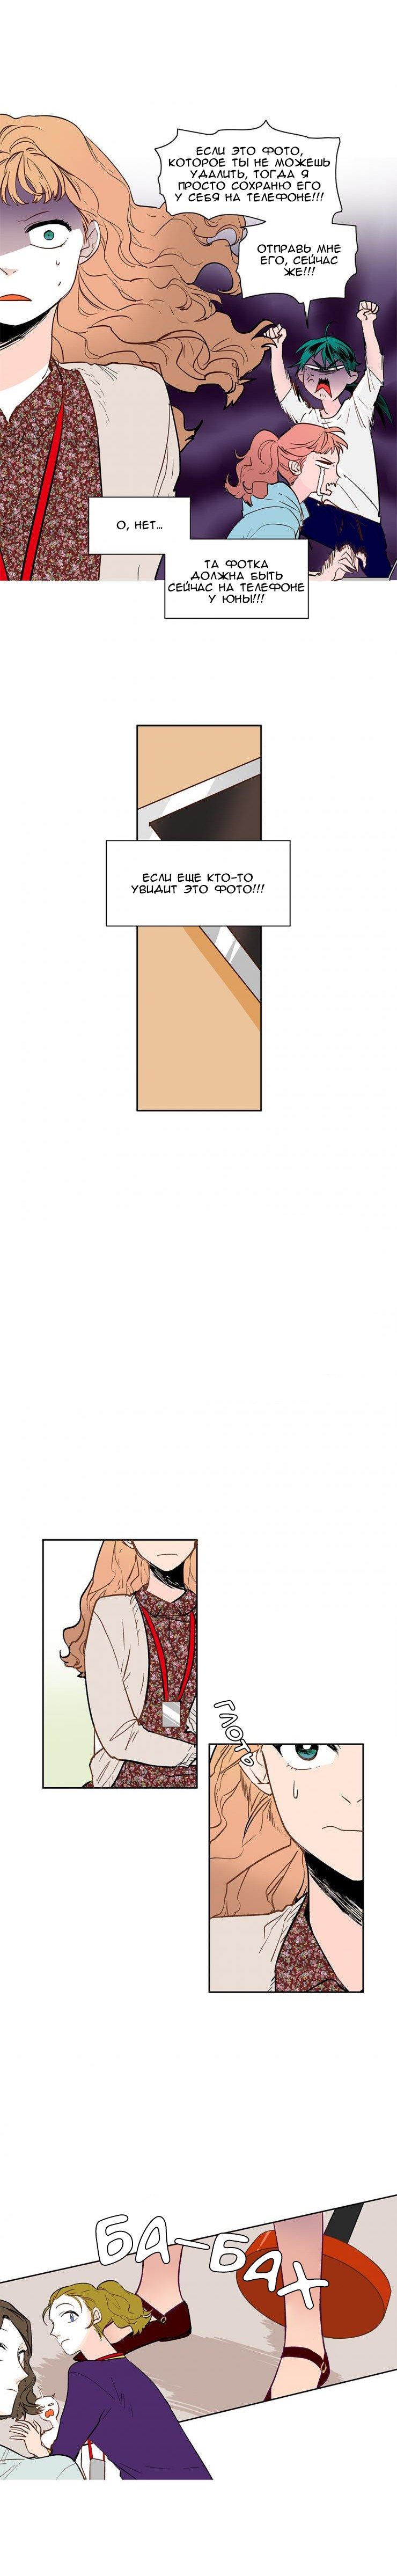 Манга Перегородки - Глава 39 Страница 1